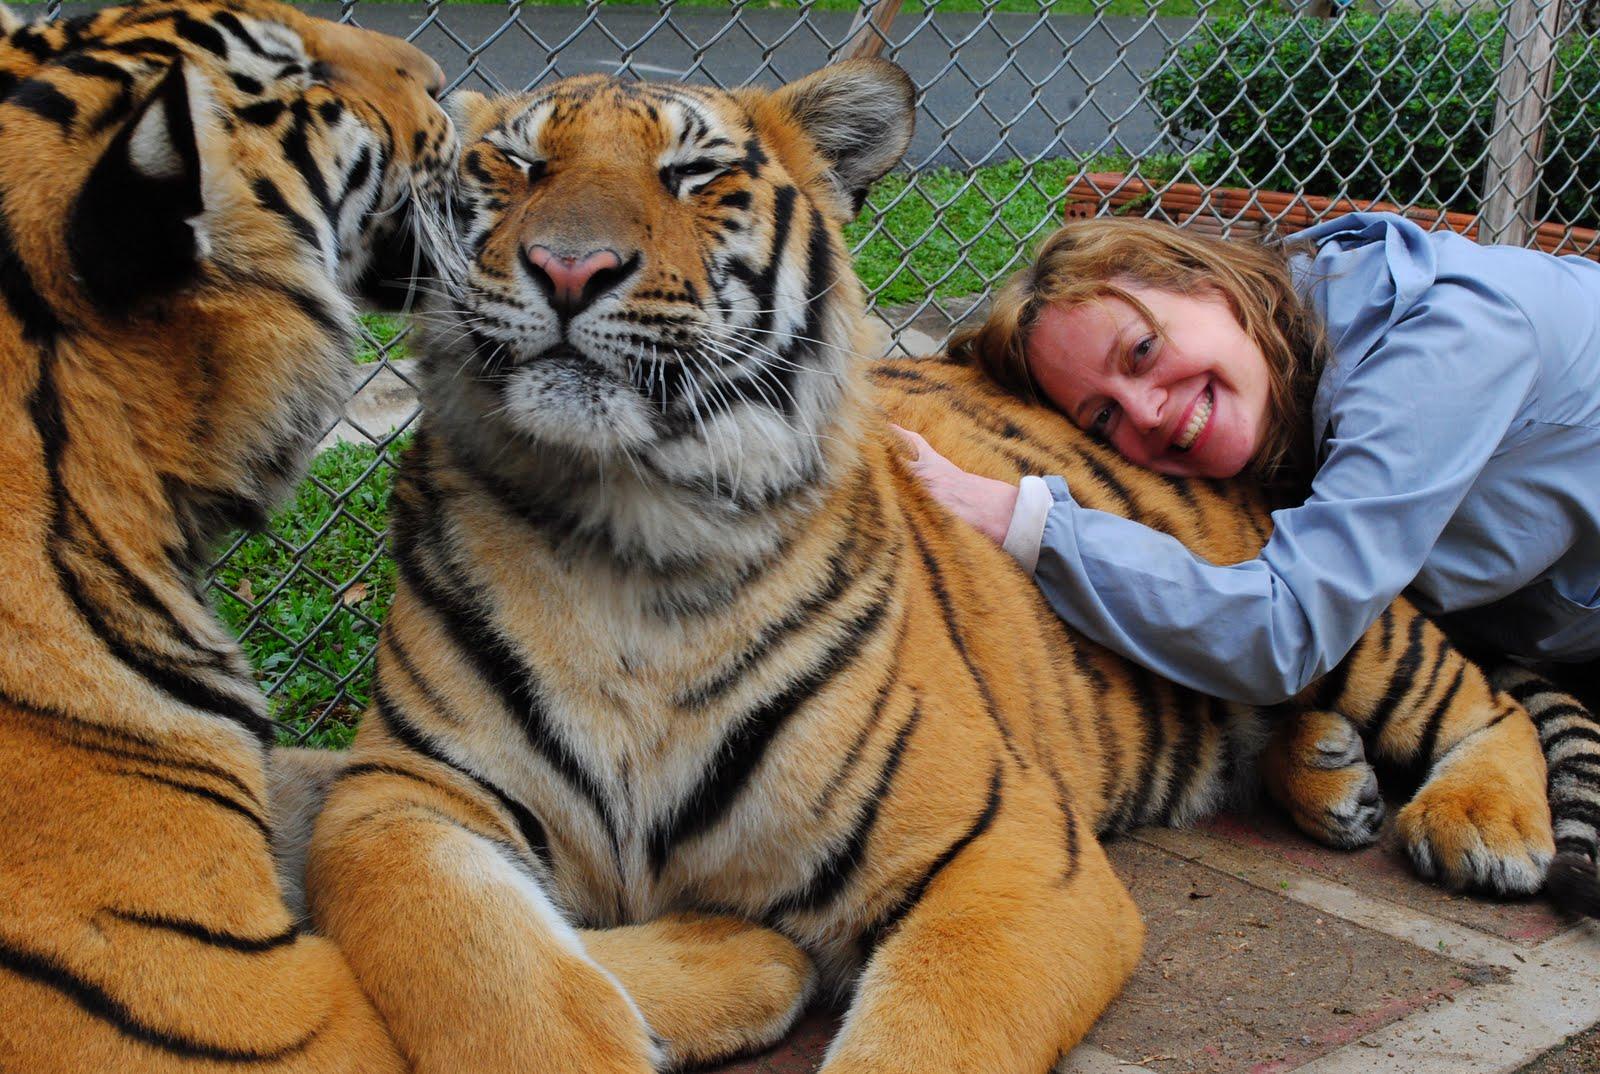 Animal Adventures: Tiger Kingdom - Thailand - 2010